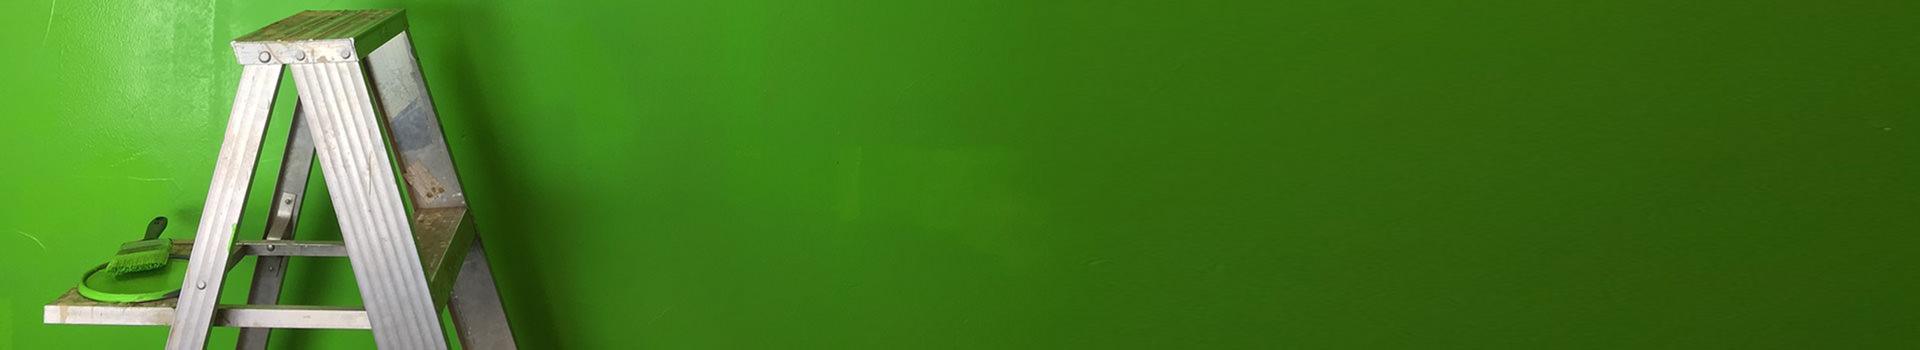 Chroma Key Sfondo Verde Photoshop